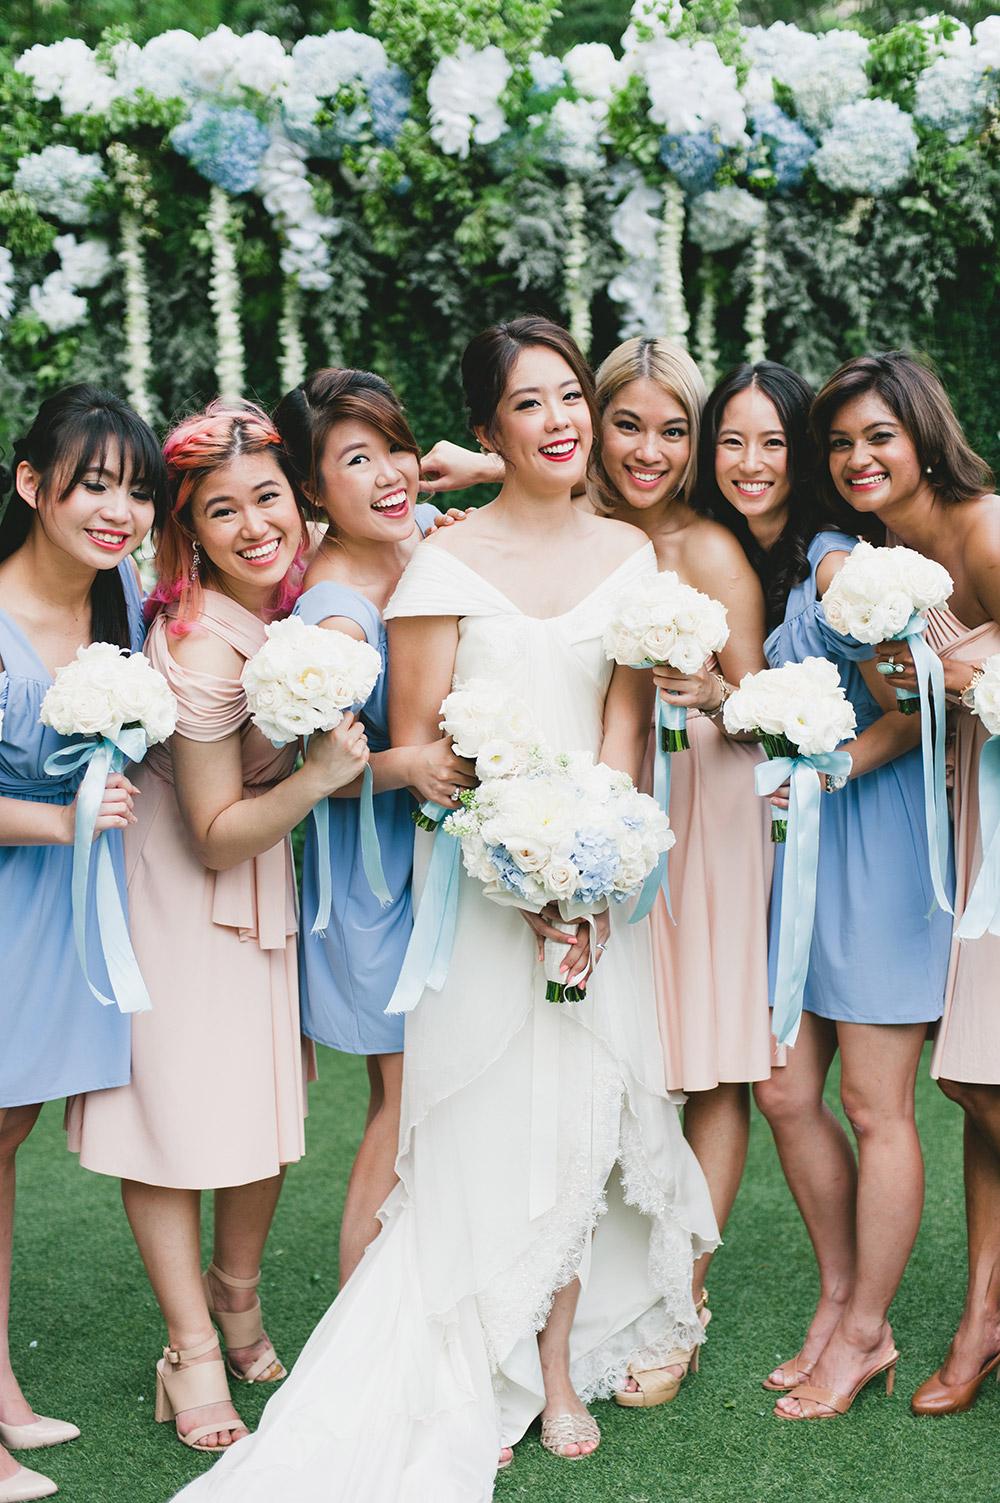 Pastel colour bridesmaids. Photo by Inlight Photos. www.theweddingnotebook.com